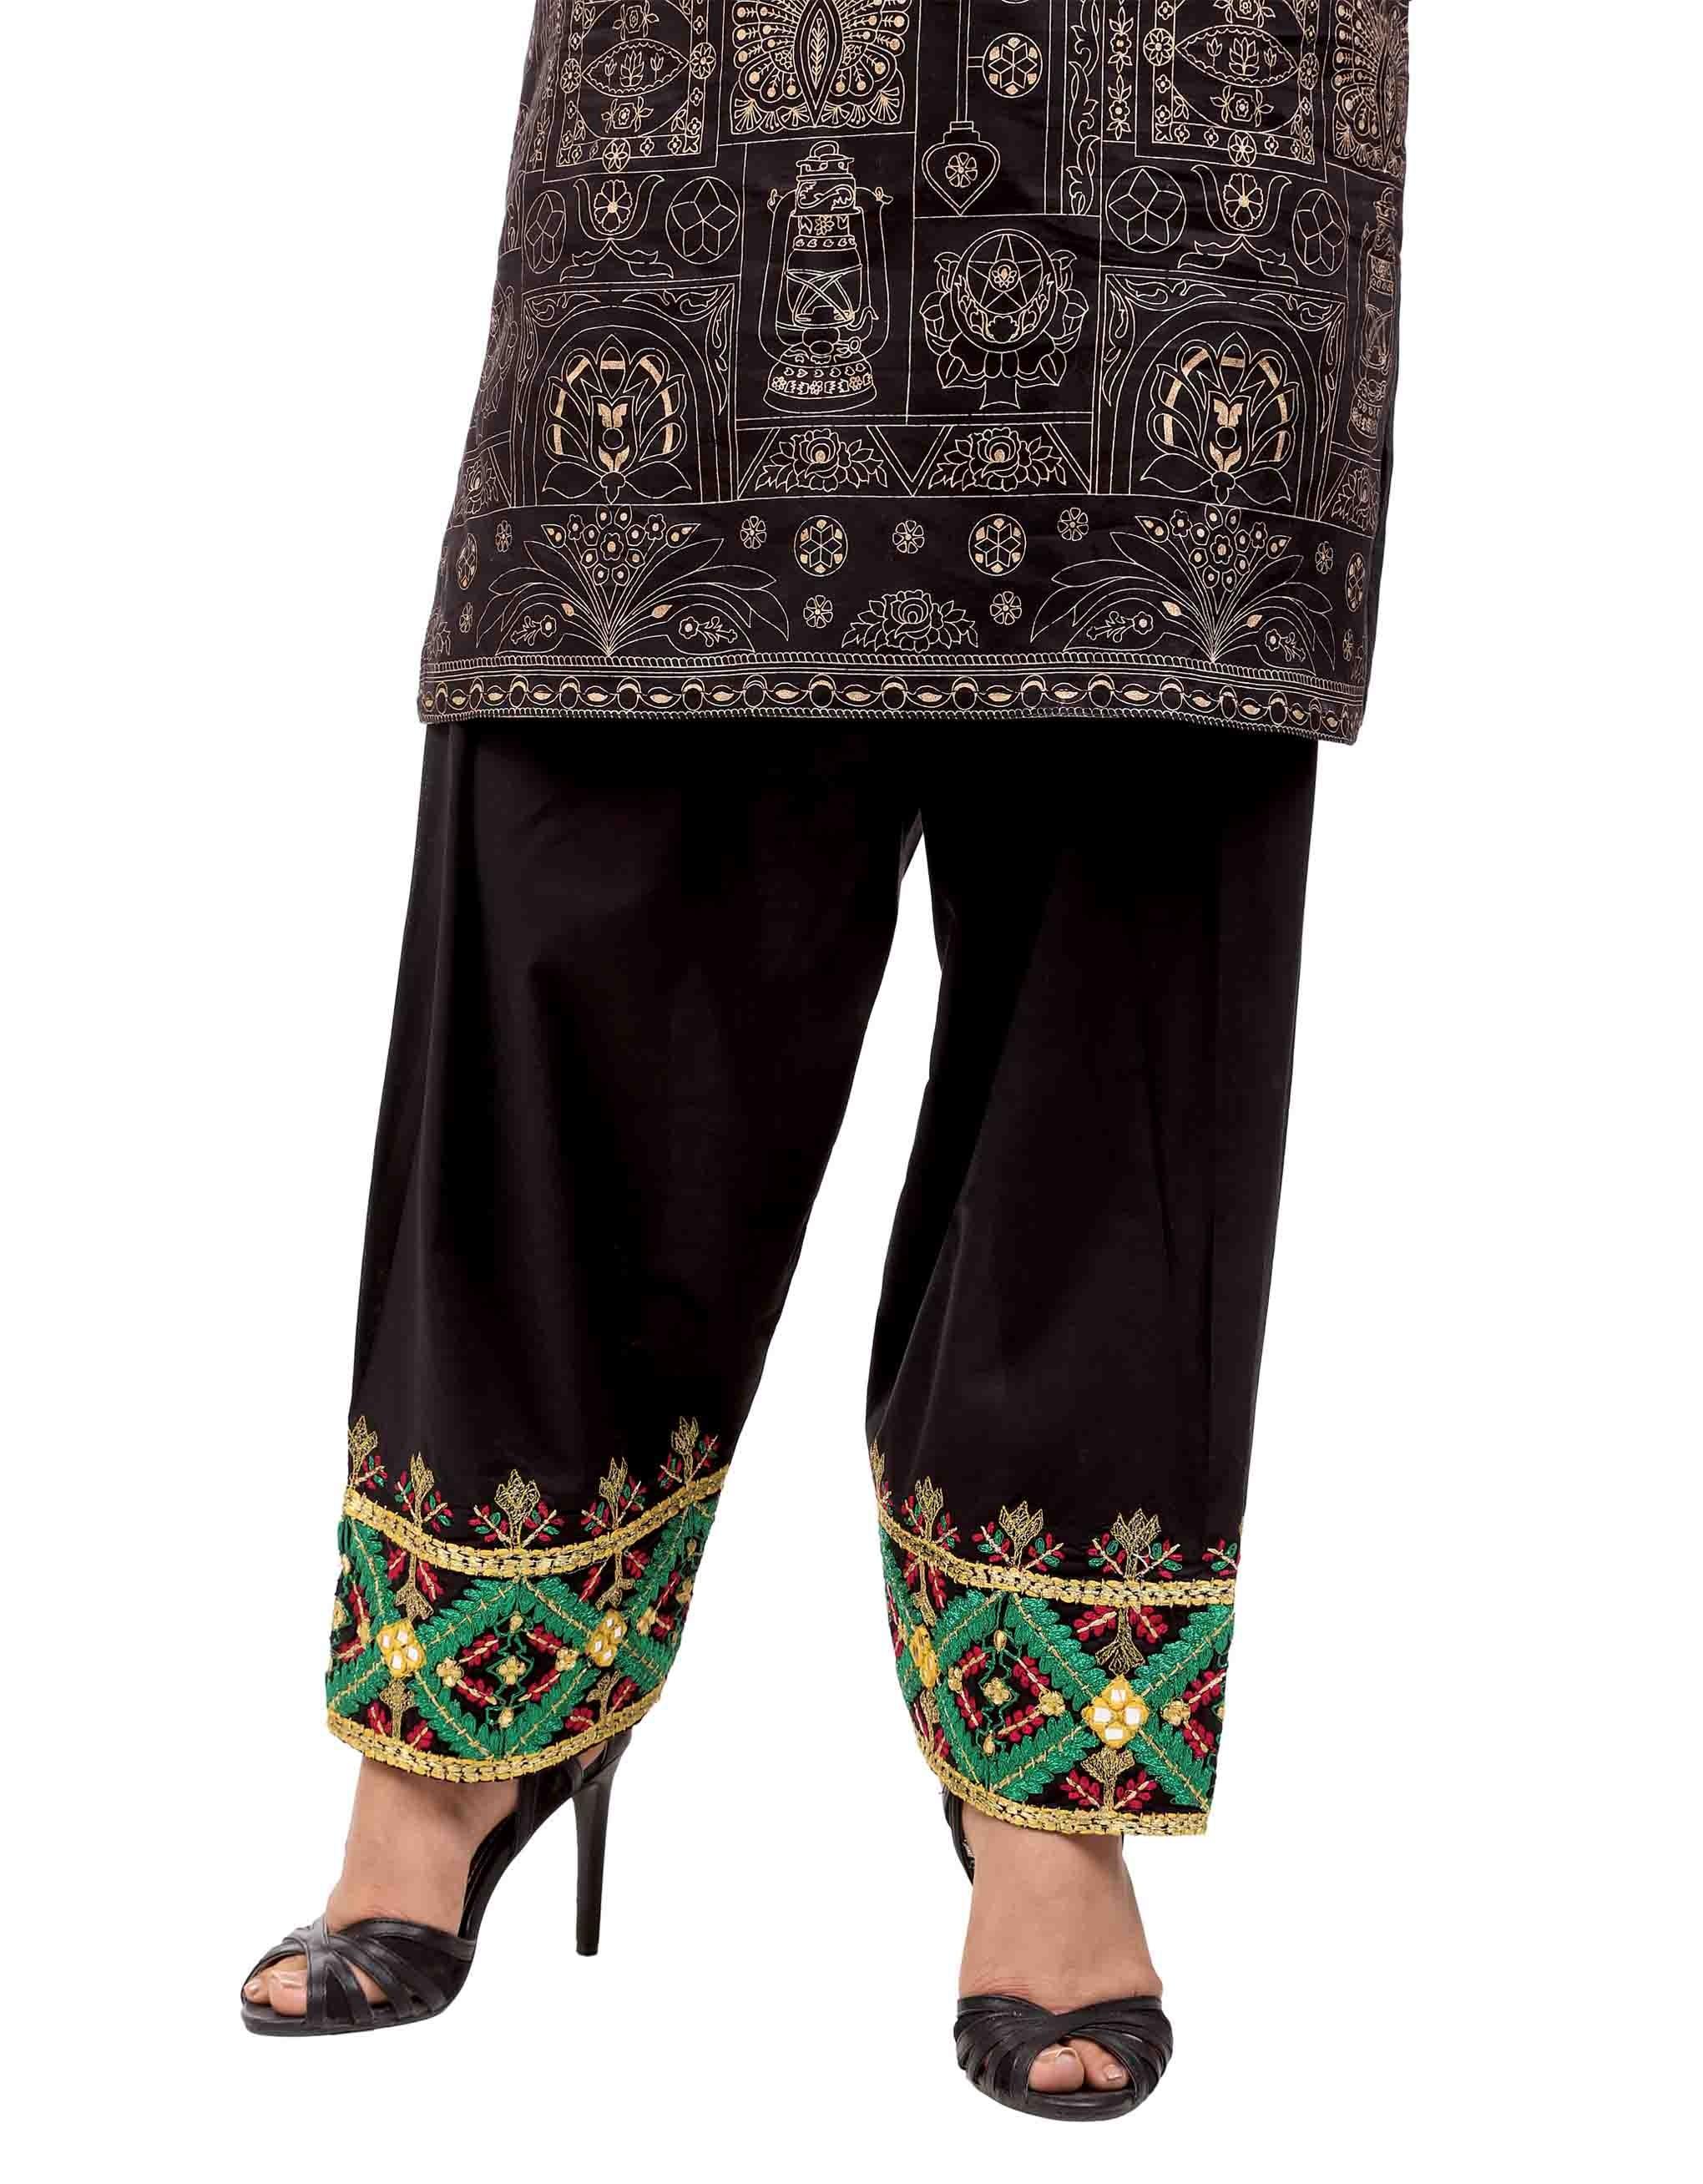 rang ja fallwinter new collection 20142015 for women